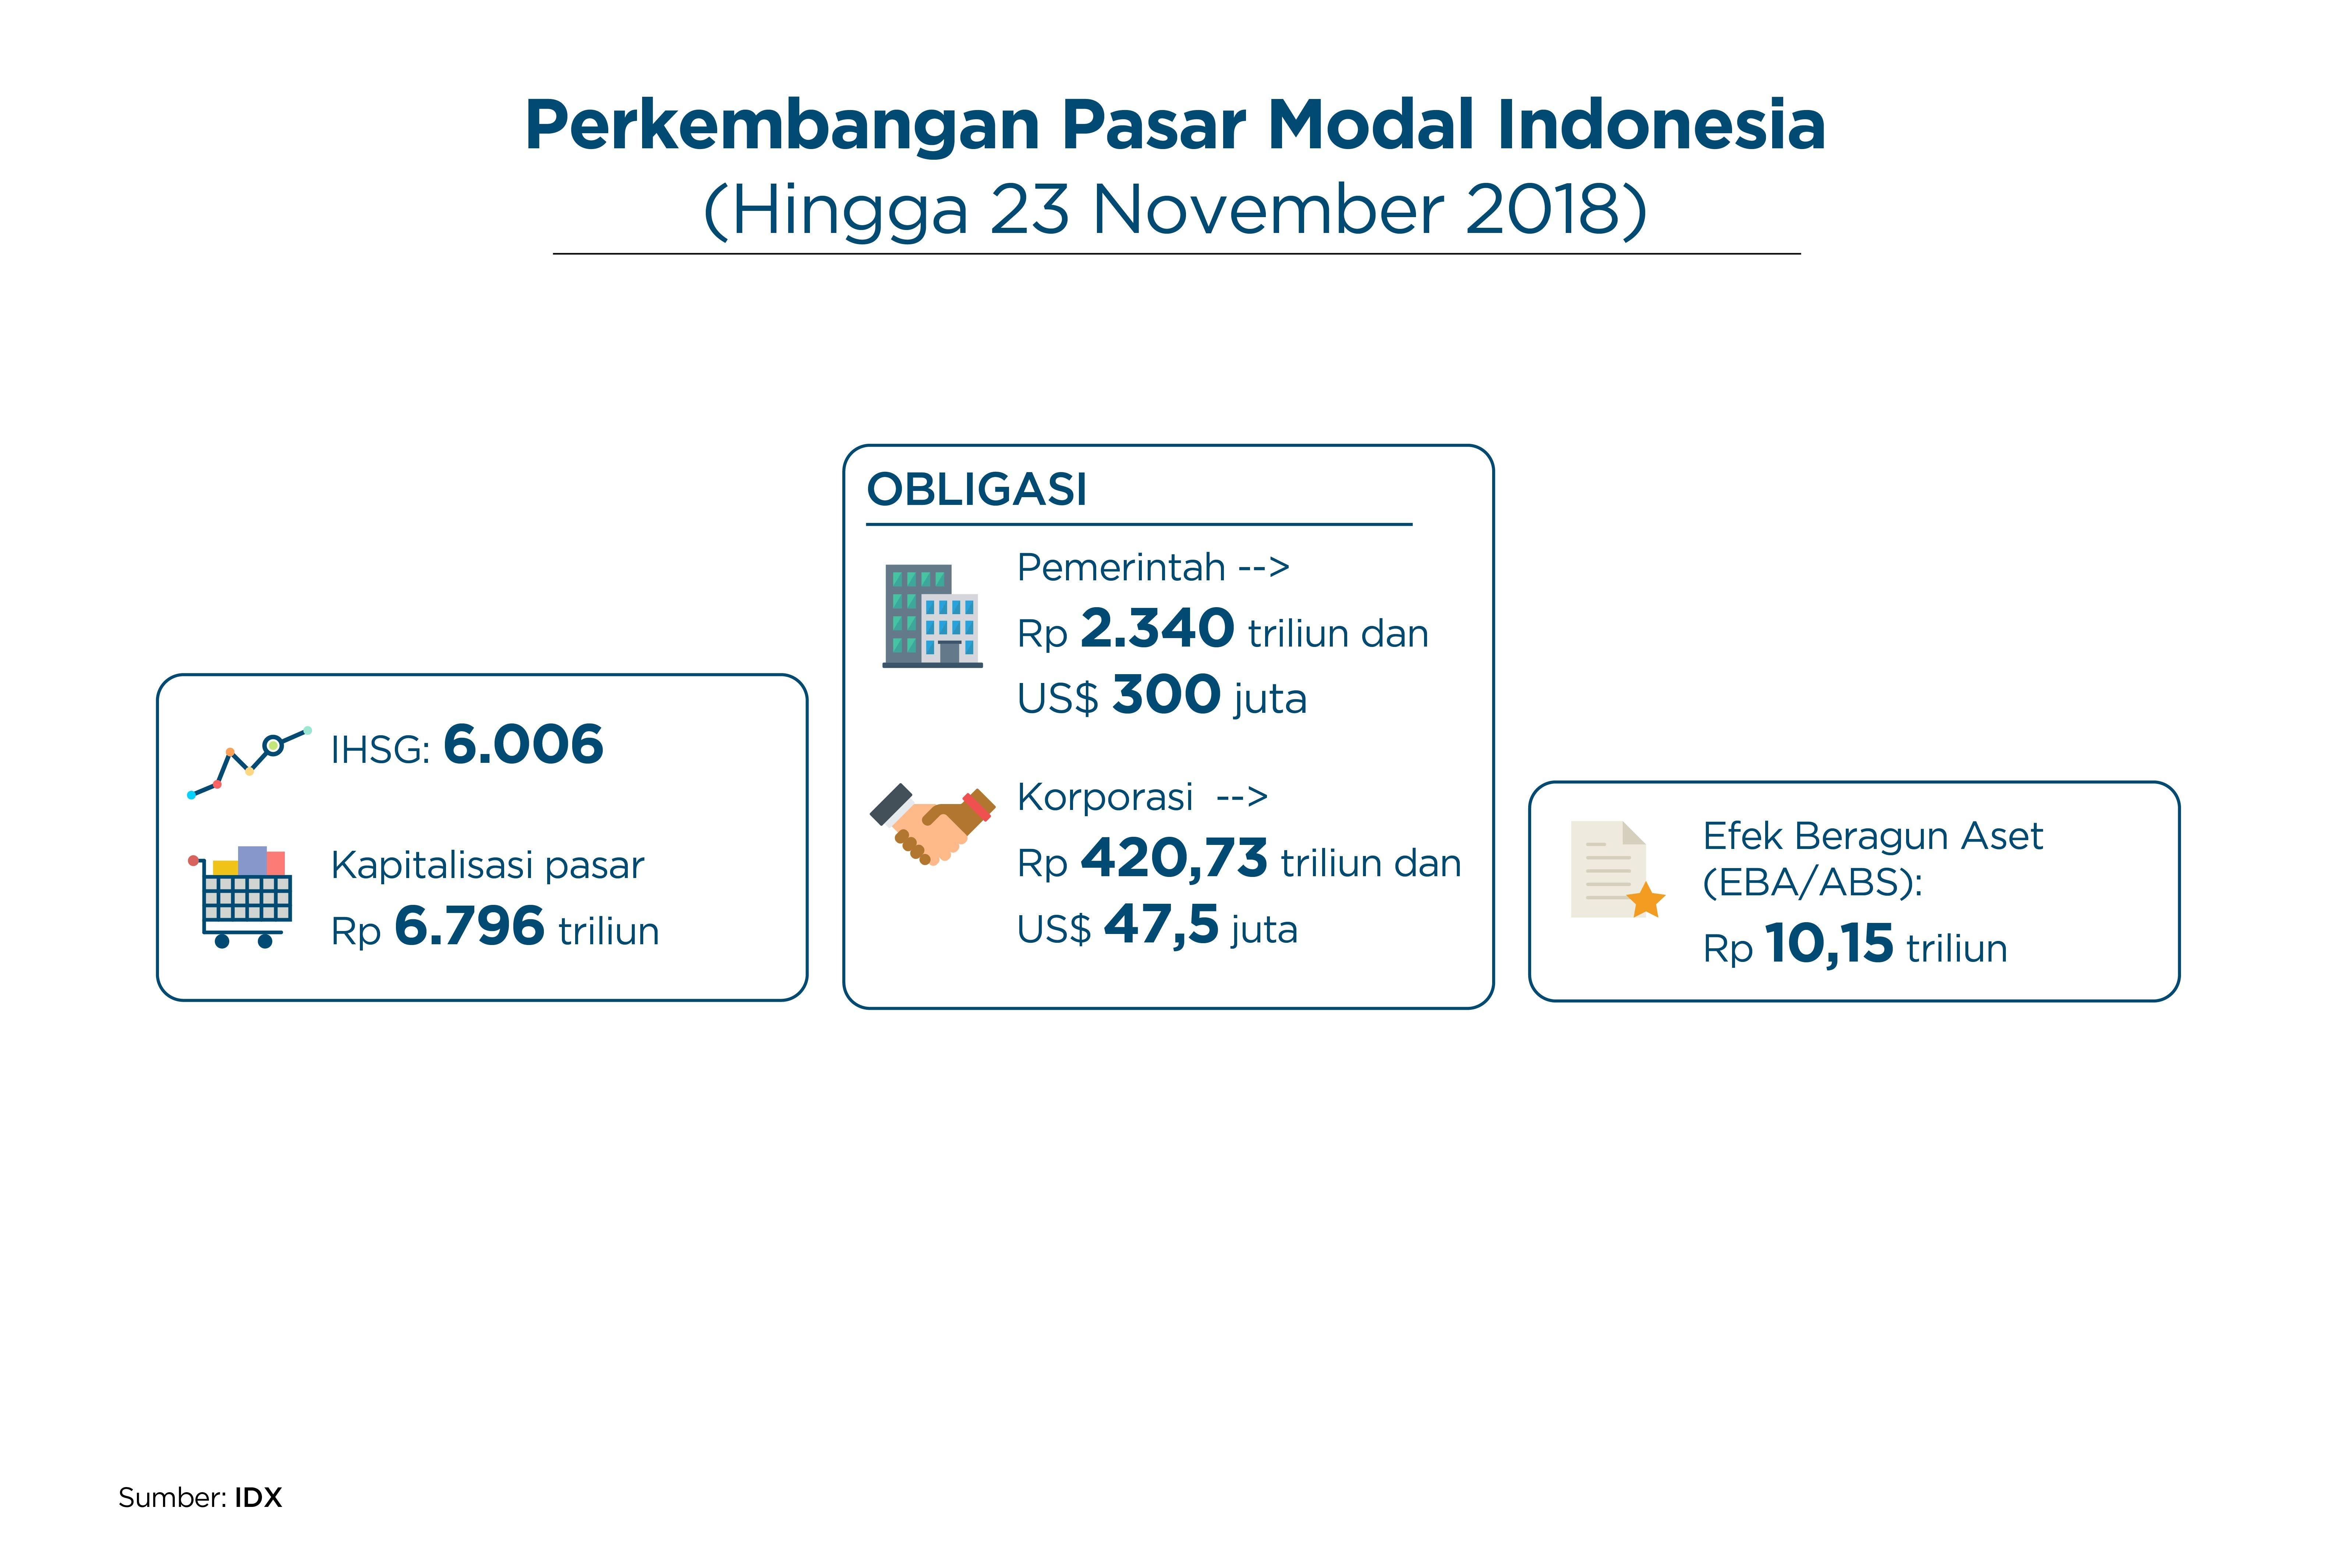 Grafik Perkembangan Pasar Modal Indonesia